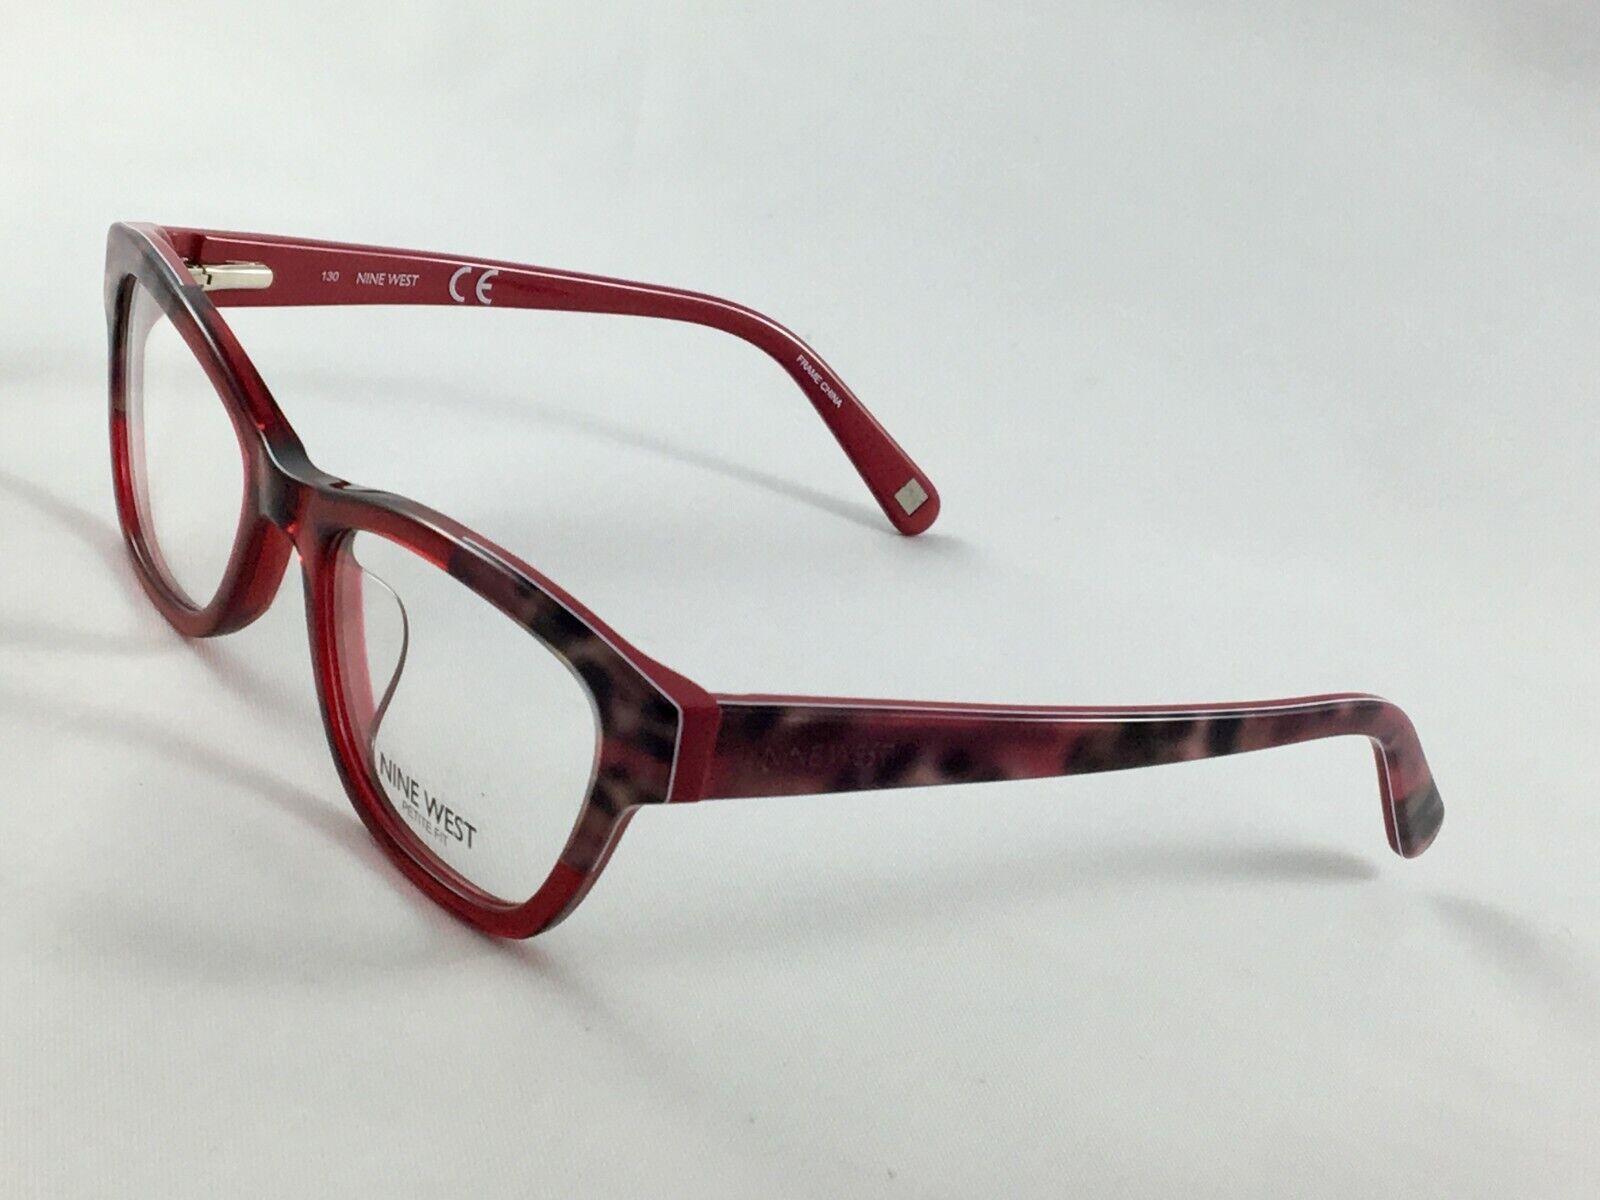 New NINE WEST NW 5126 217 Petite Fit Women's Eyeglasses Frames 48-18-130